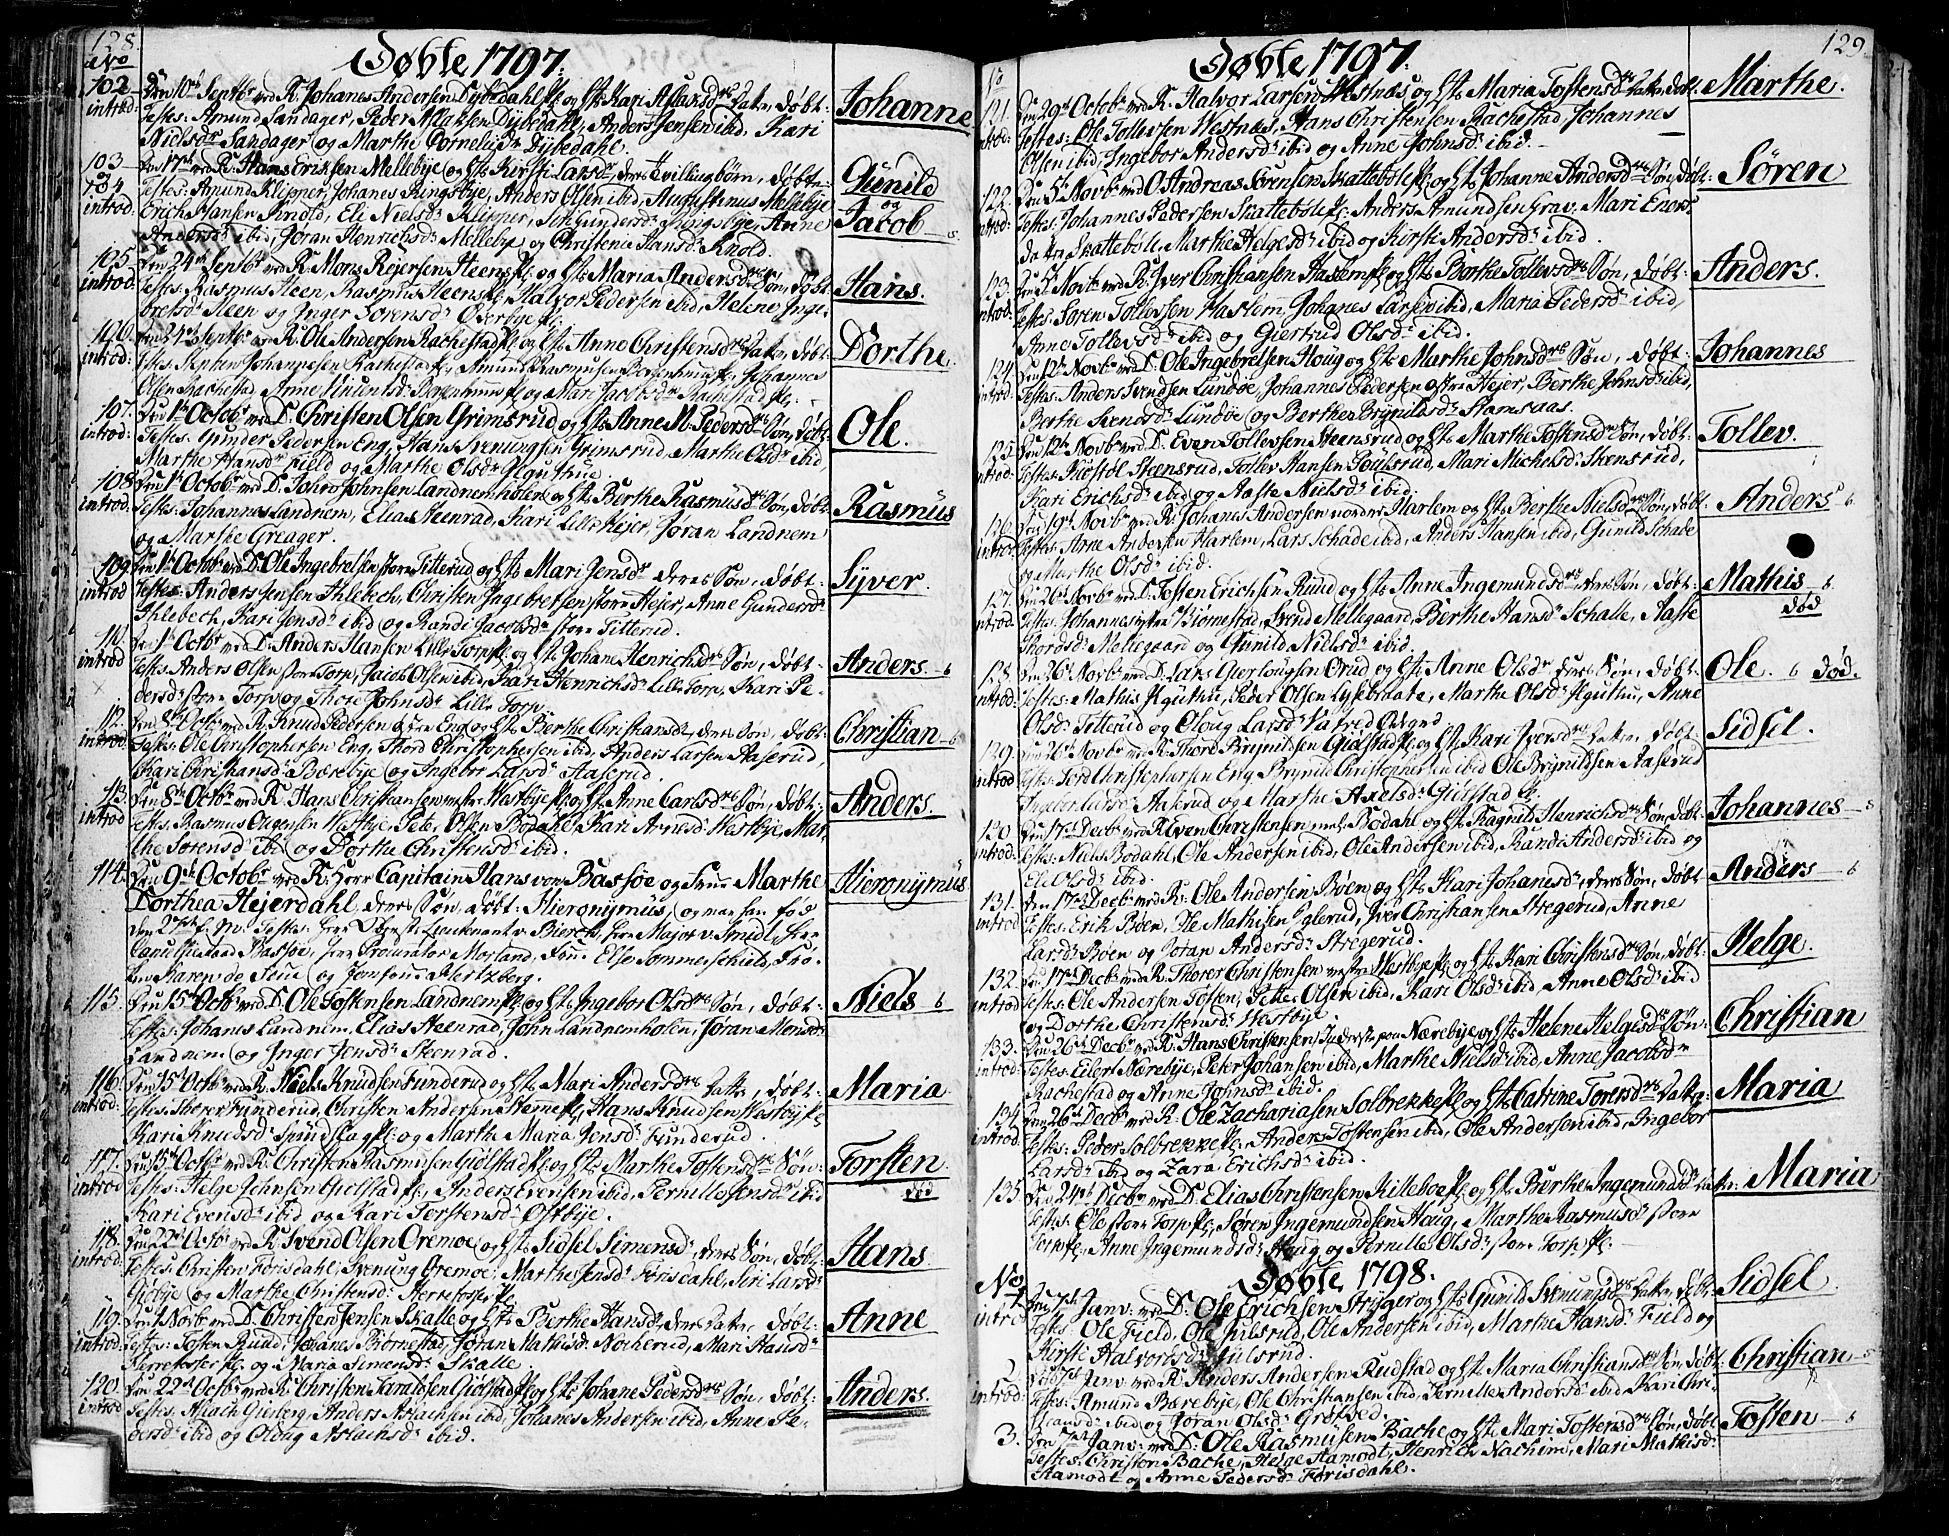 SAO, Rakkestad prestekontor Kirkebøker, F/Fa/L0005: Ministerialbok nr. I 5, 1784-1814, s. 128-129